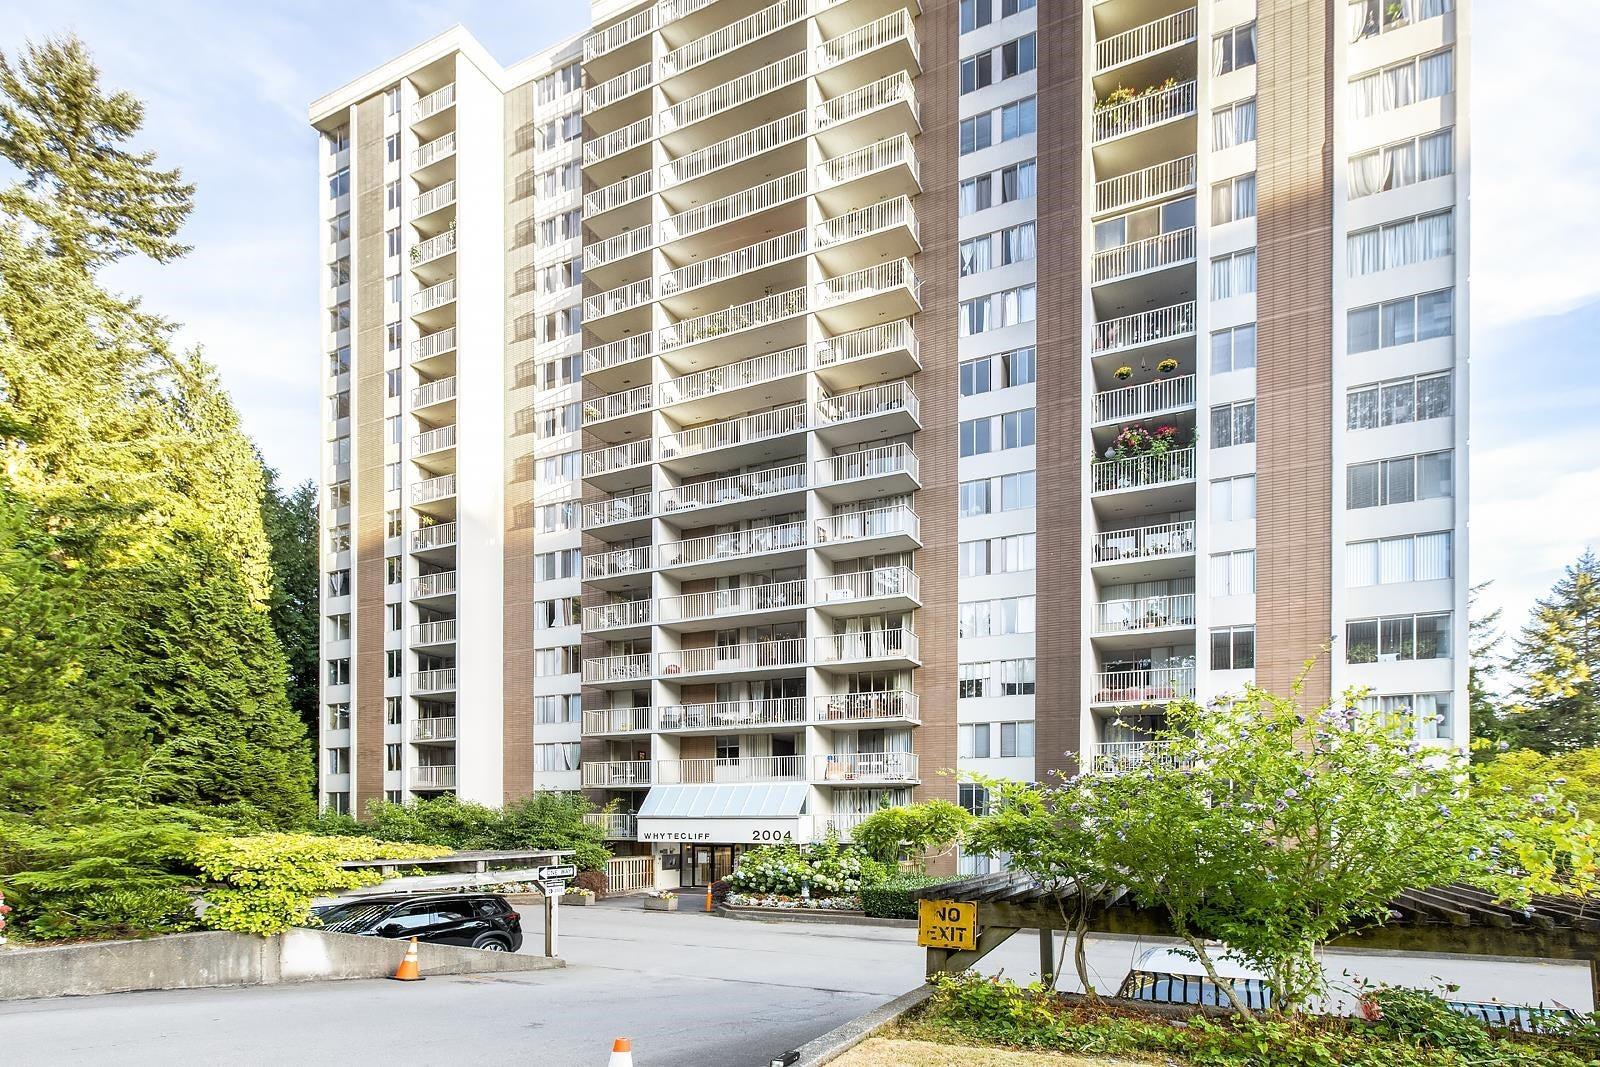 503 2004 FULLERTON AVENUE - Pemberton NV Apartment/Condo for sale, 2 Bedrooms (R2627984) - #1